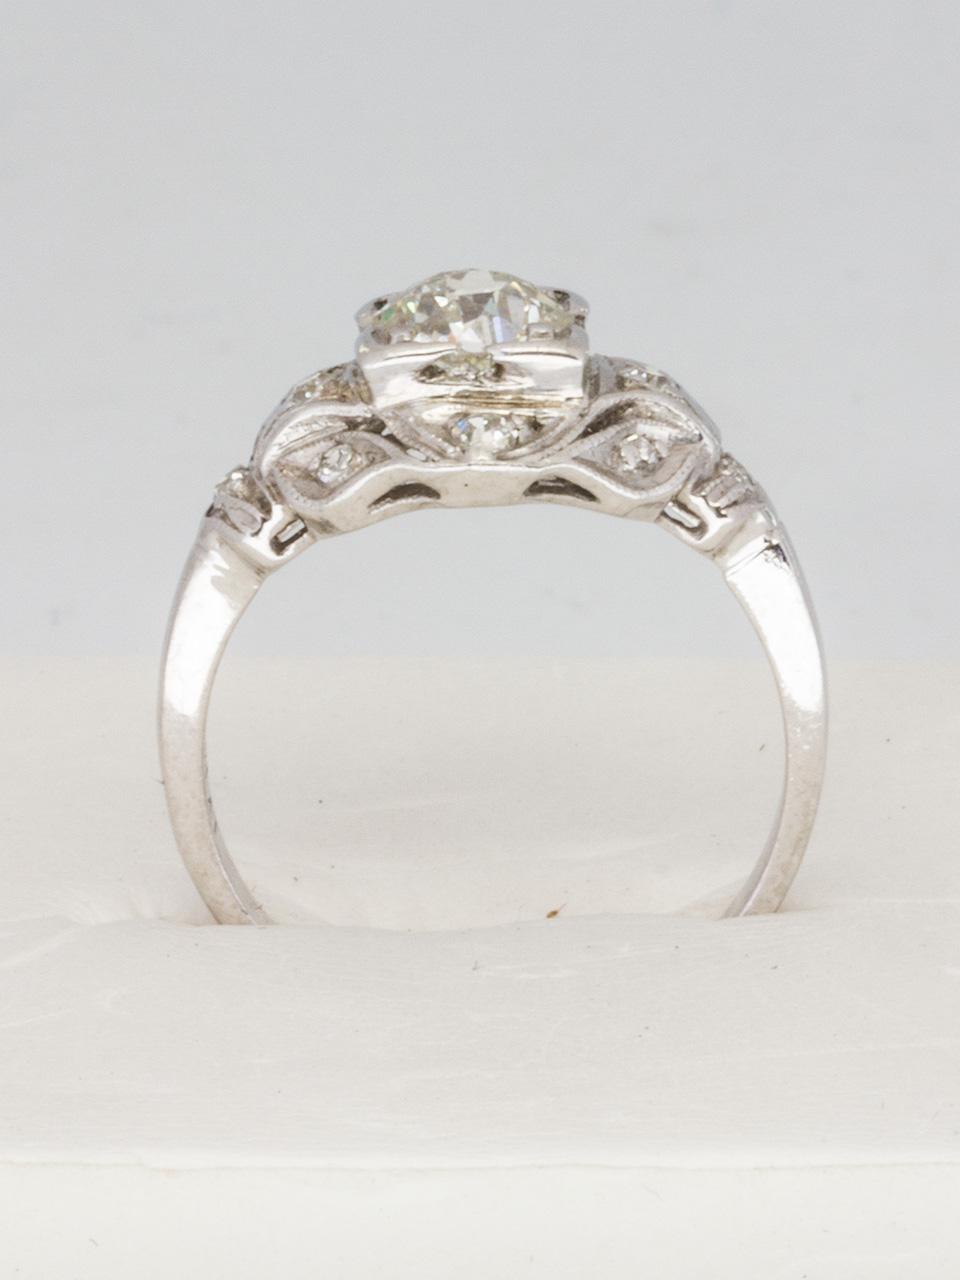 Vintage Engagement Ring Platinum 0.52ct Old Mine Cut H-SI1 circa 1930s